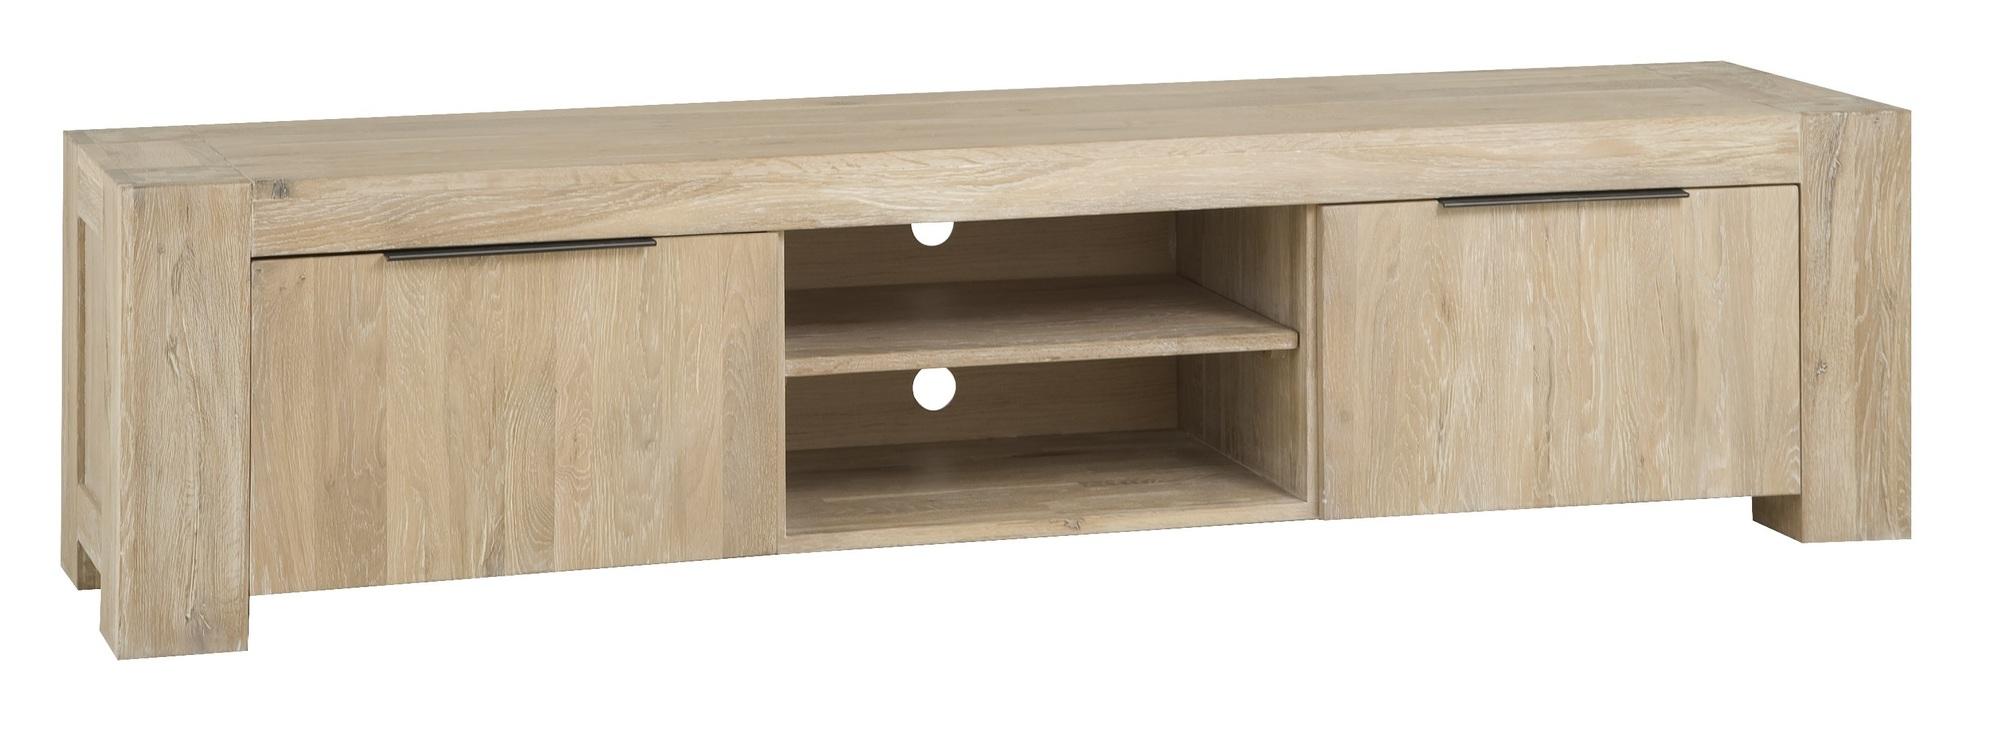 TV dressoir Luuk 210 cm